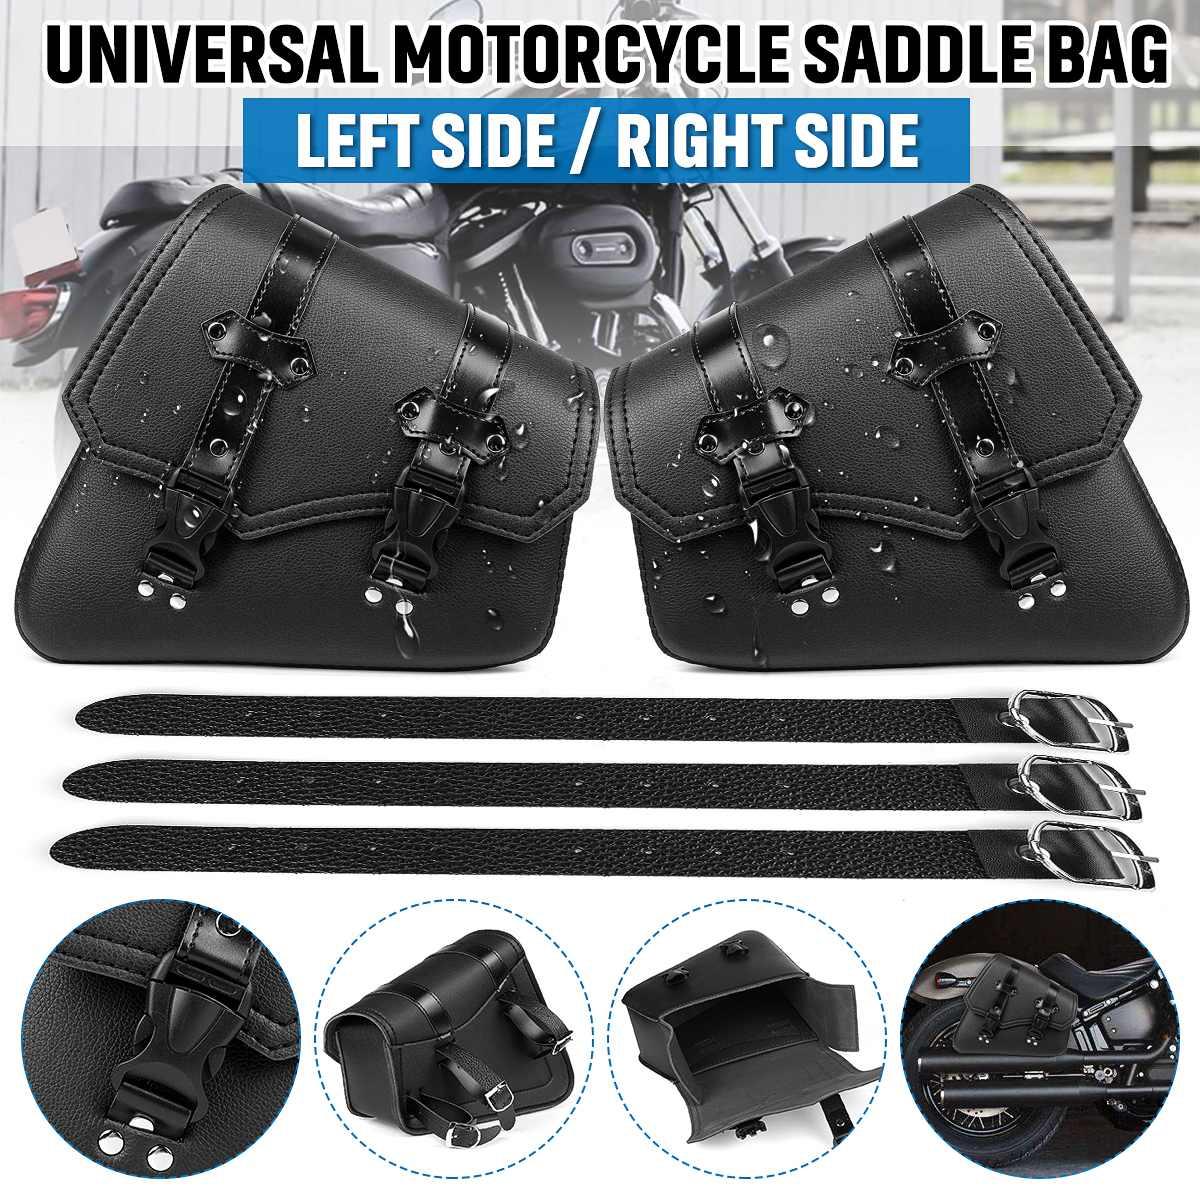 Motorcycle Saddlebags Side Tool Bag PU Leather Luggage Saddle Bag Pouch Black Universal